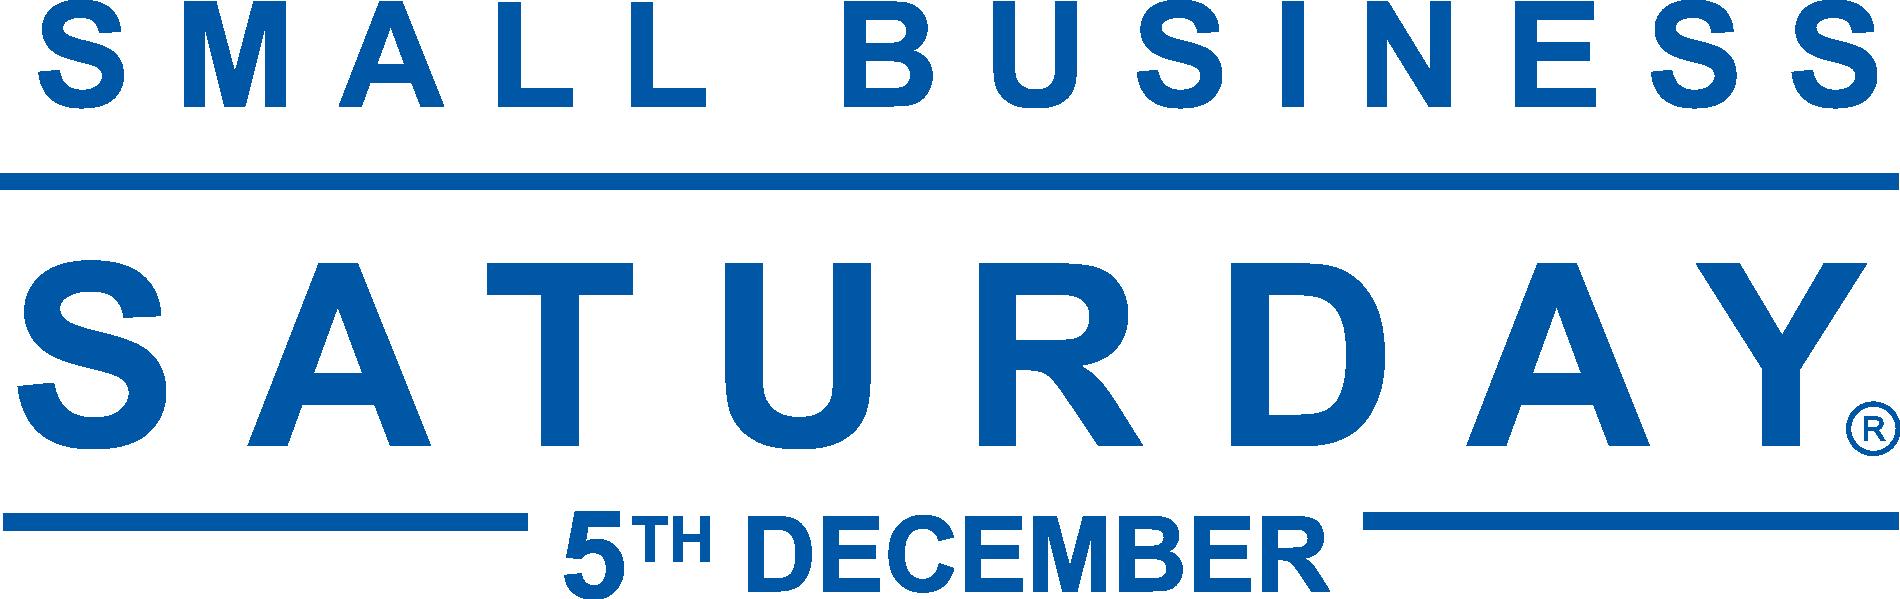 small-business-saturday-uk-2020-logo-english-white.png